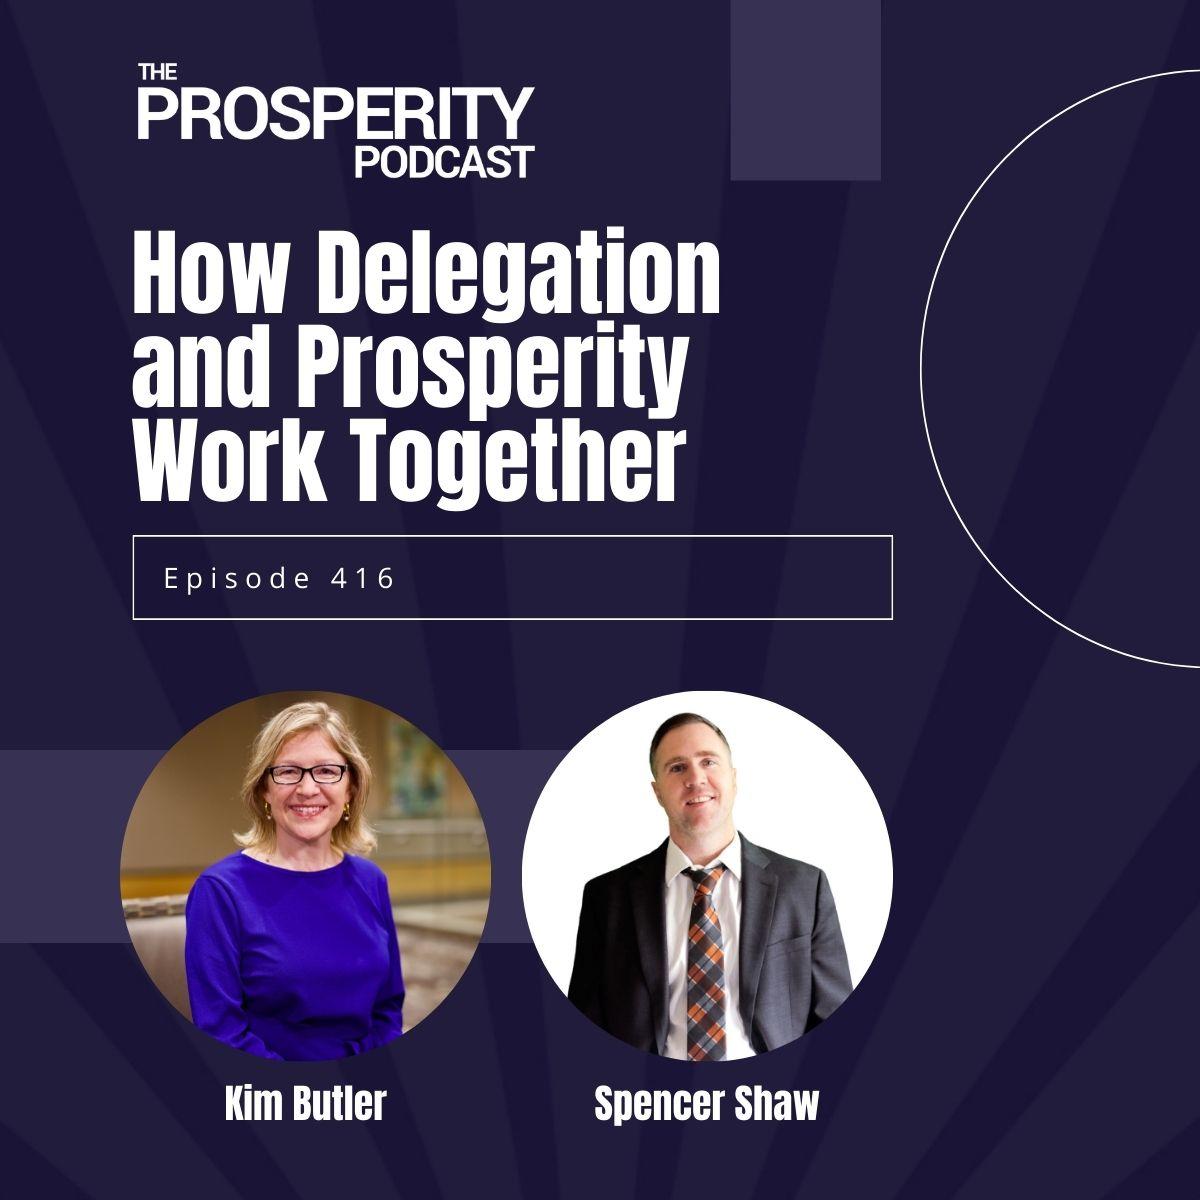 How Delegation and Prosperity Work Together